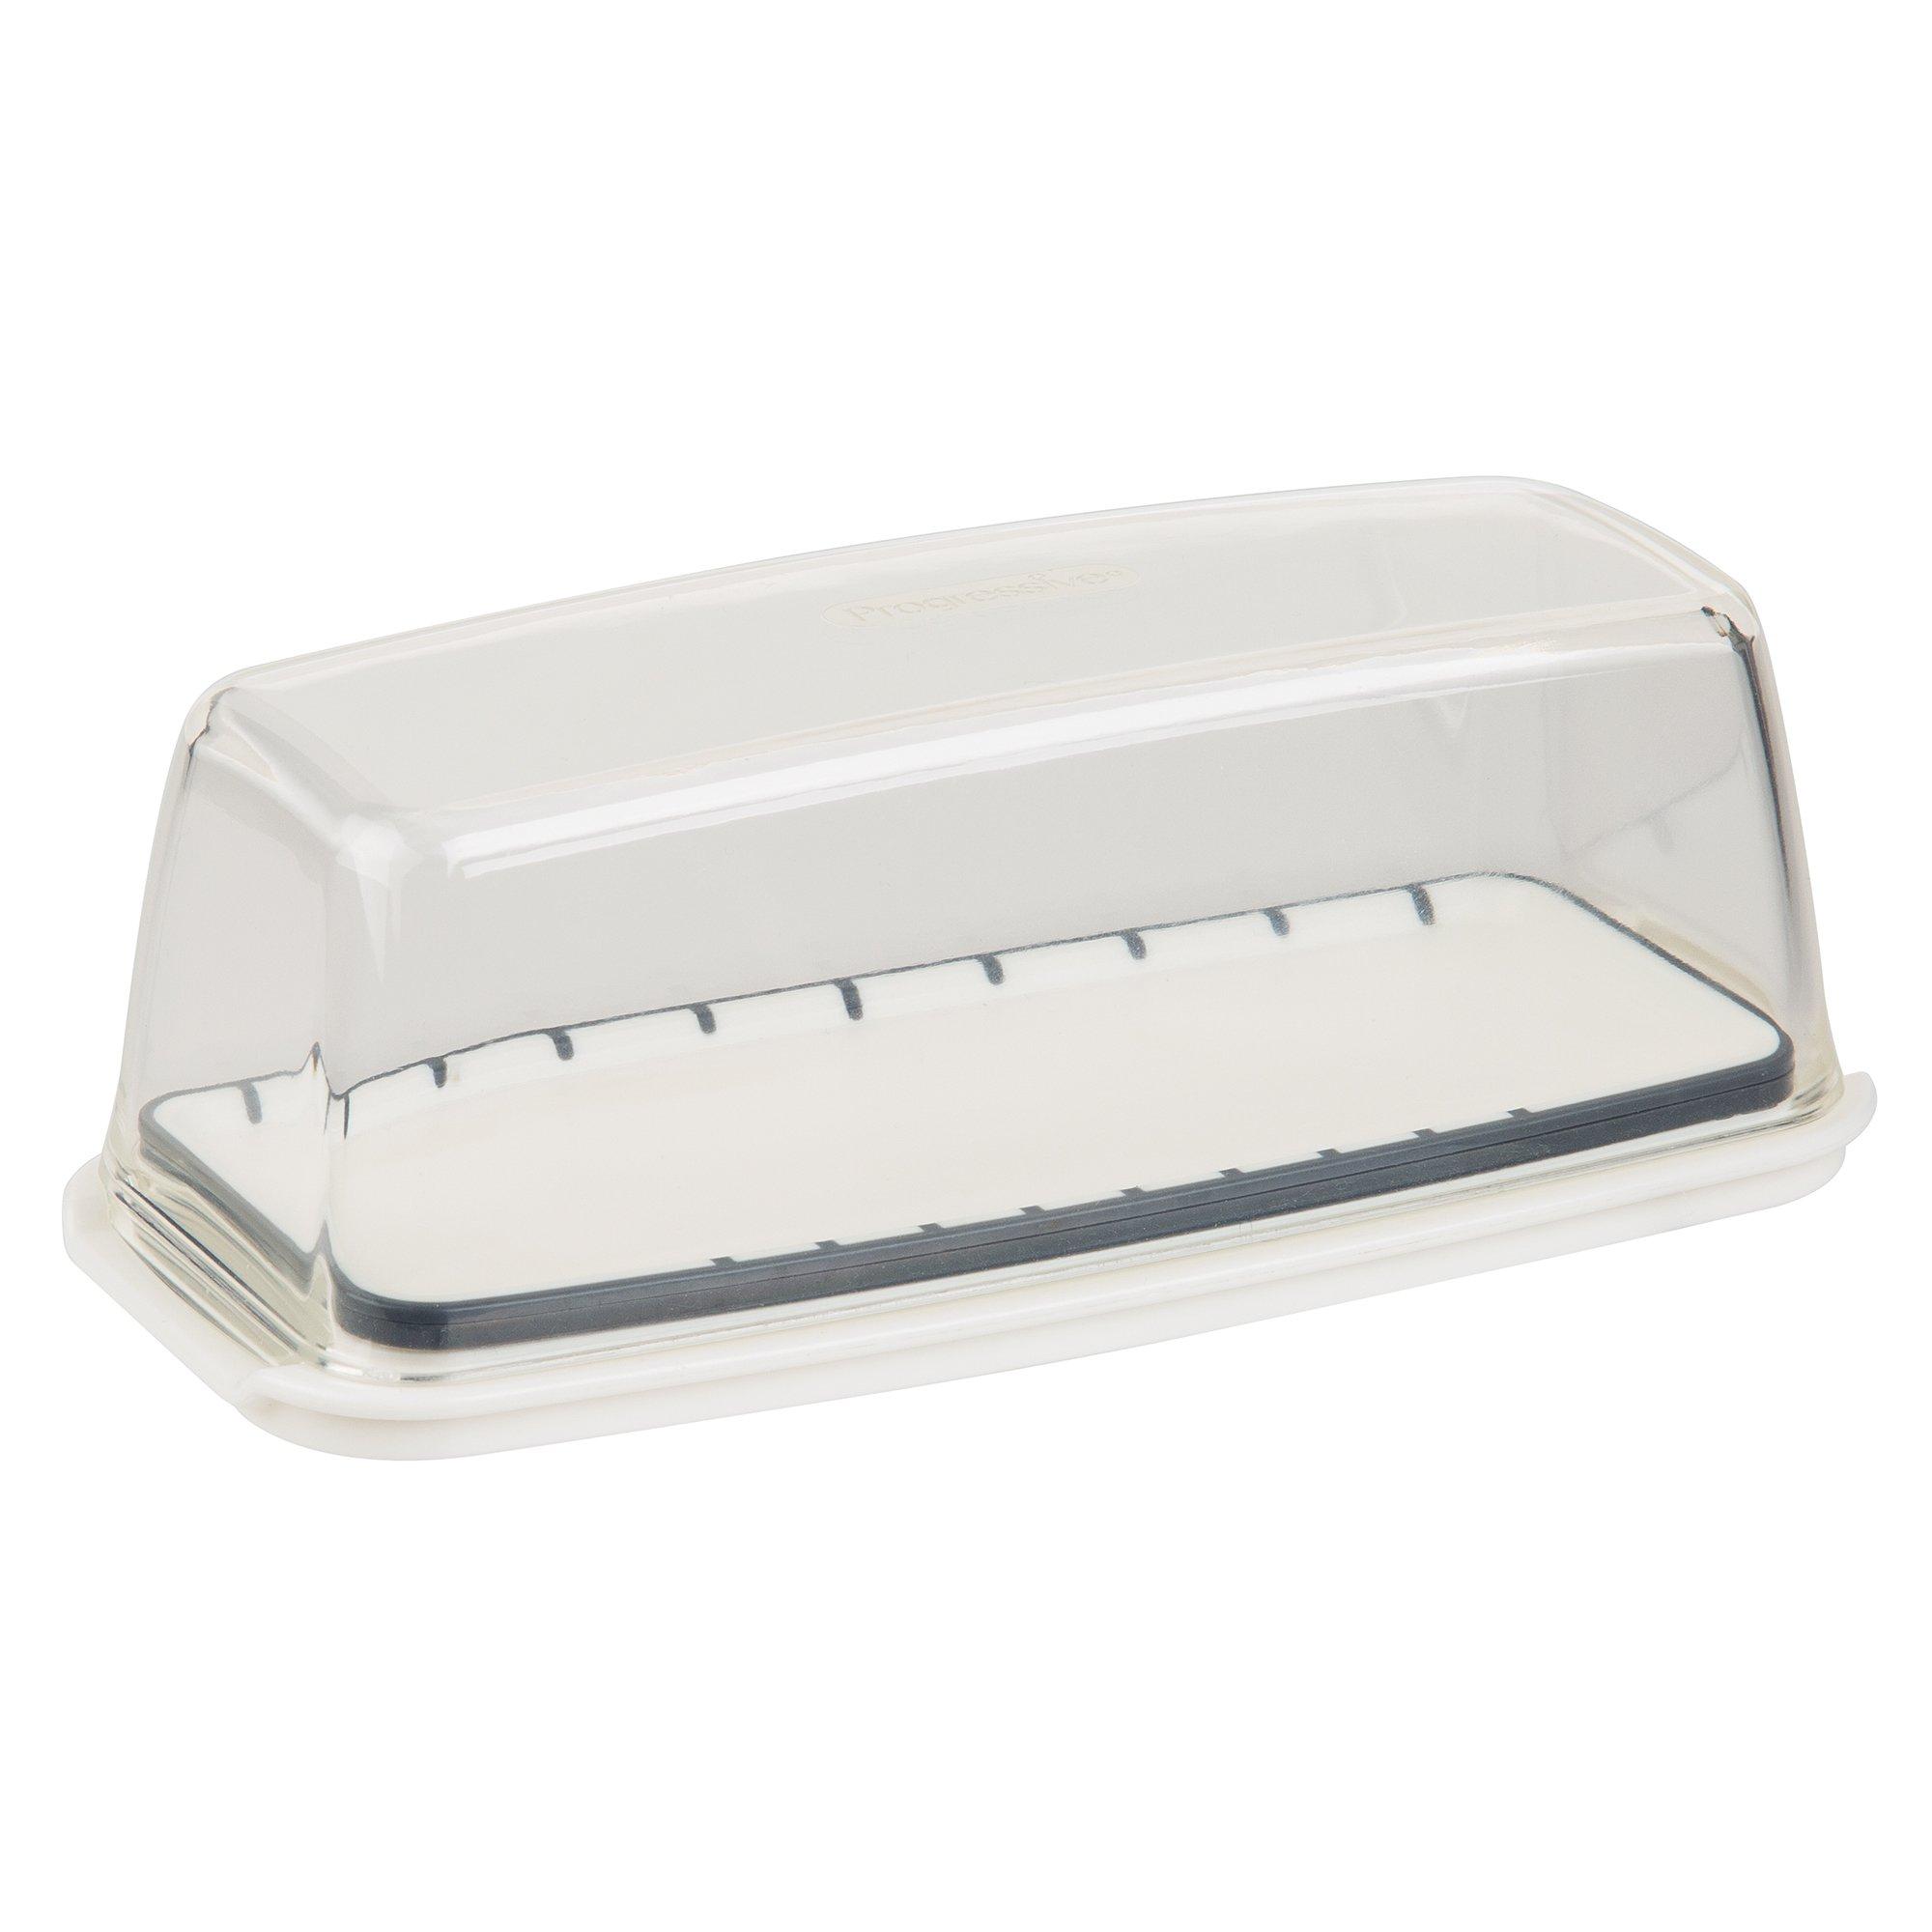 Prepworks by Progressive GBD-2 Butterdish Silicone Seal, Air Tight Butter Dish